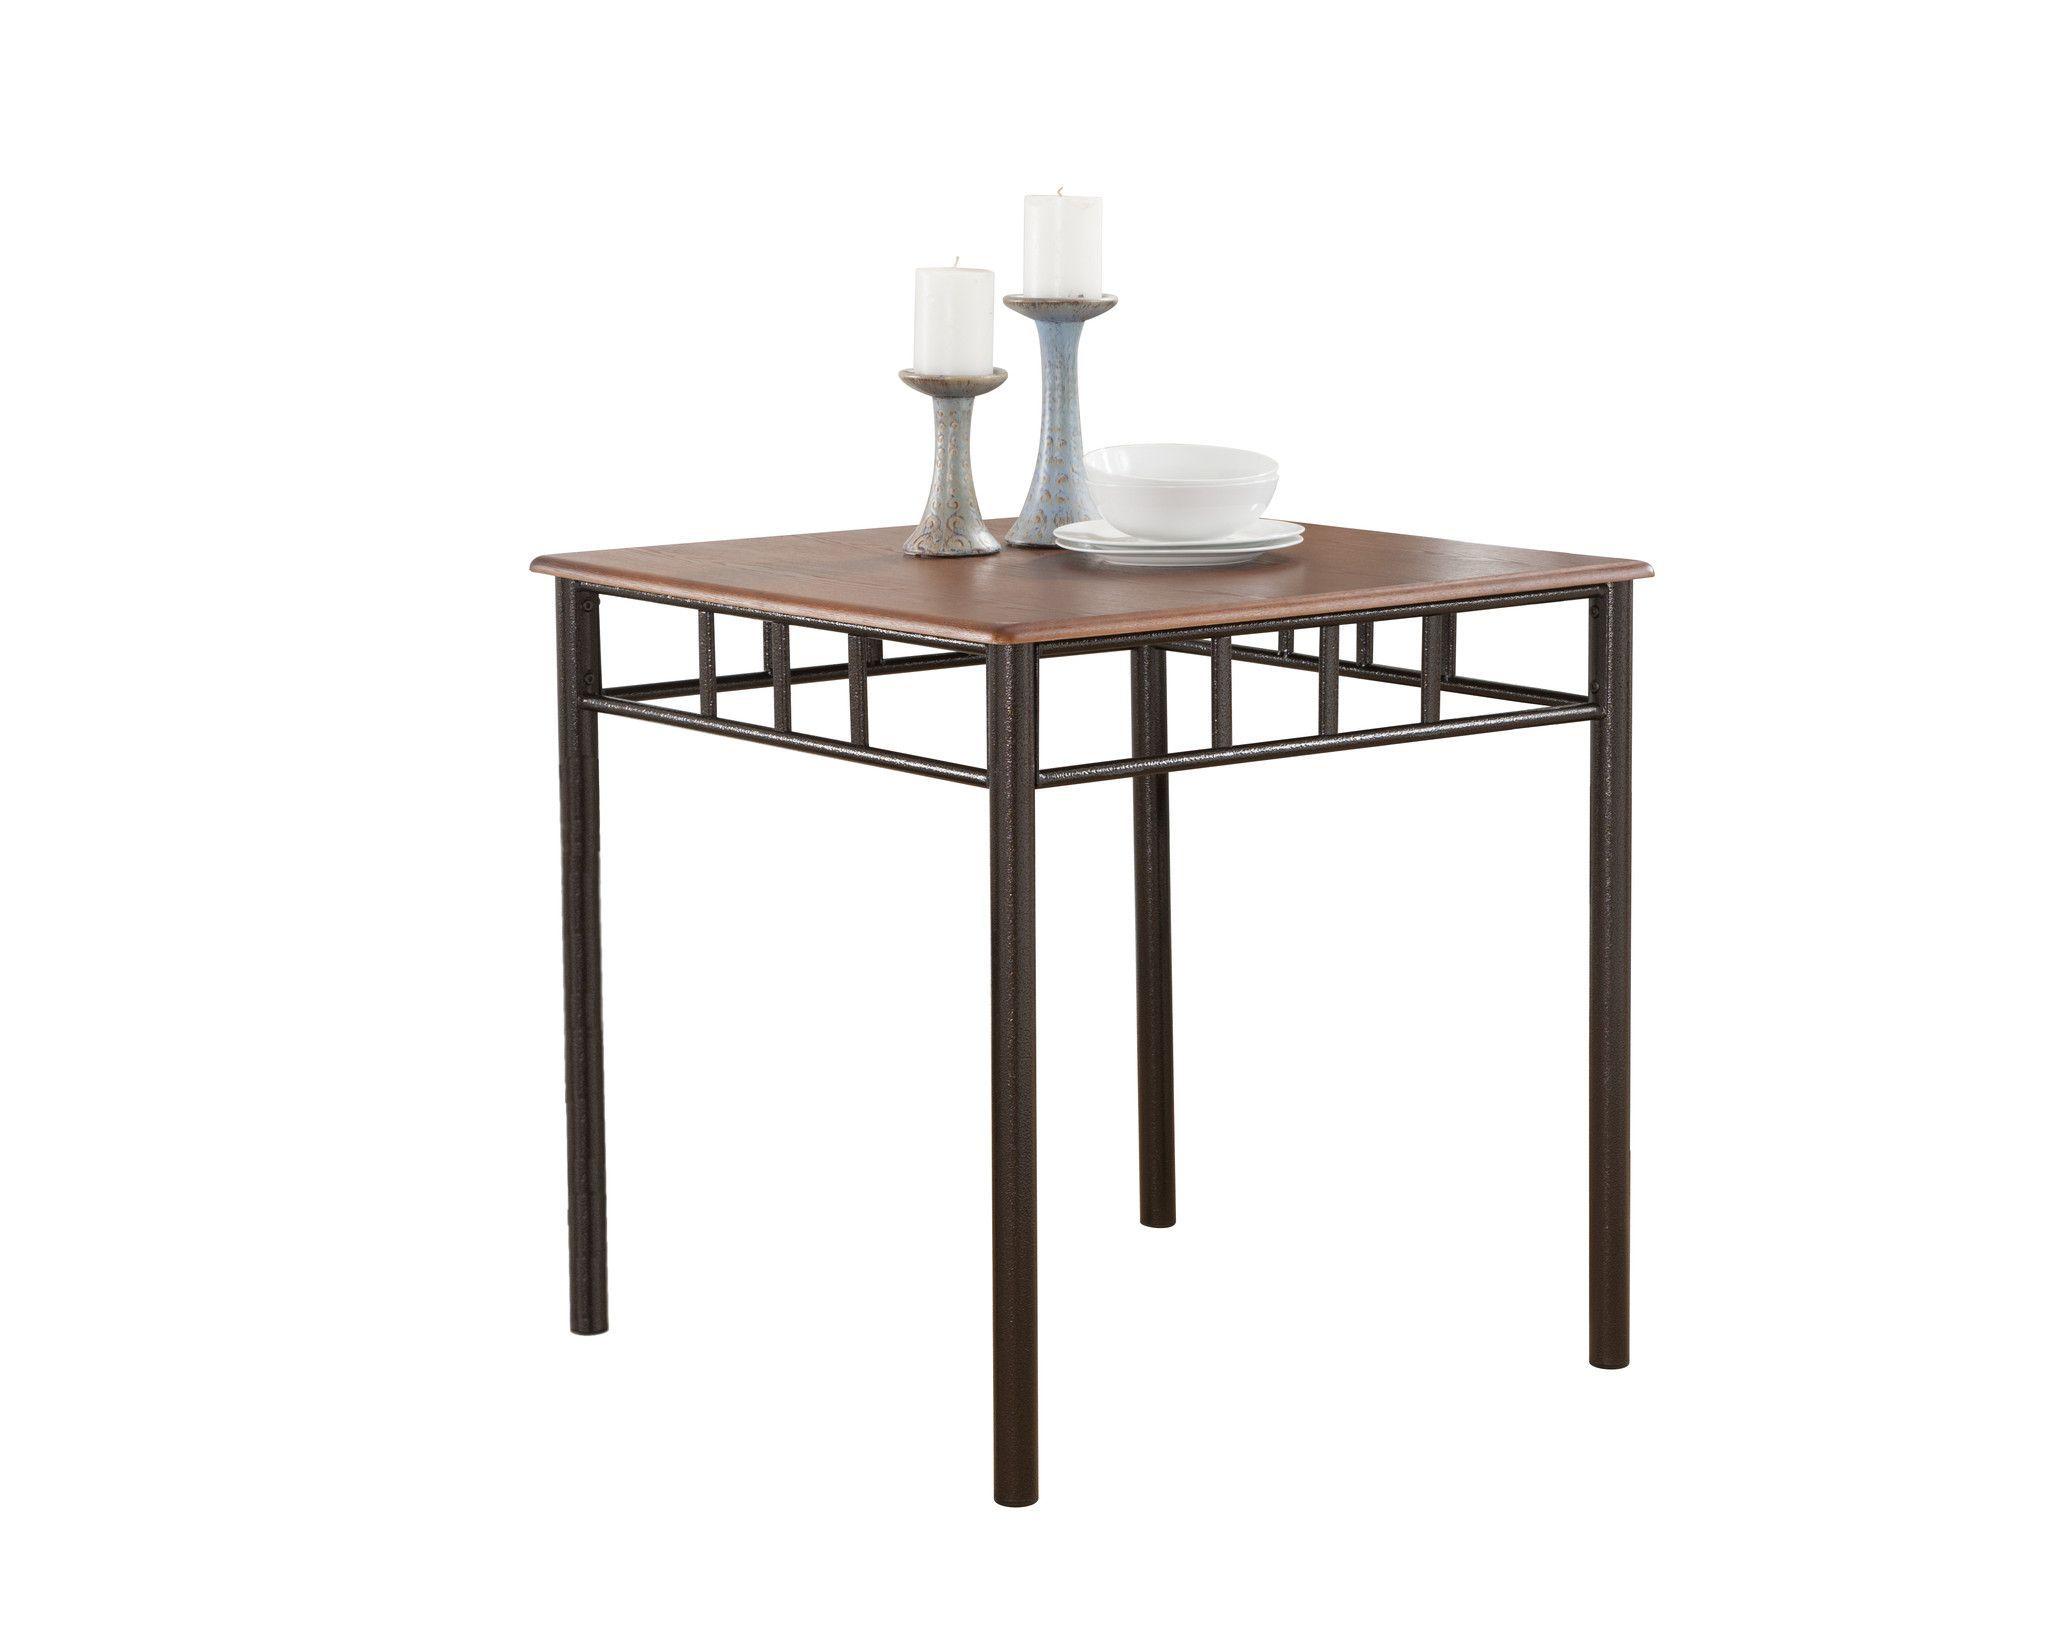 Pilaster Designs Piece Dining Room Dinette Kitchen Set Square